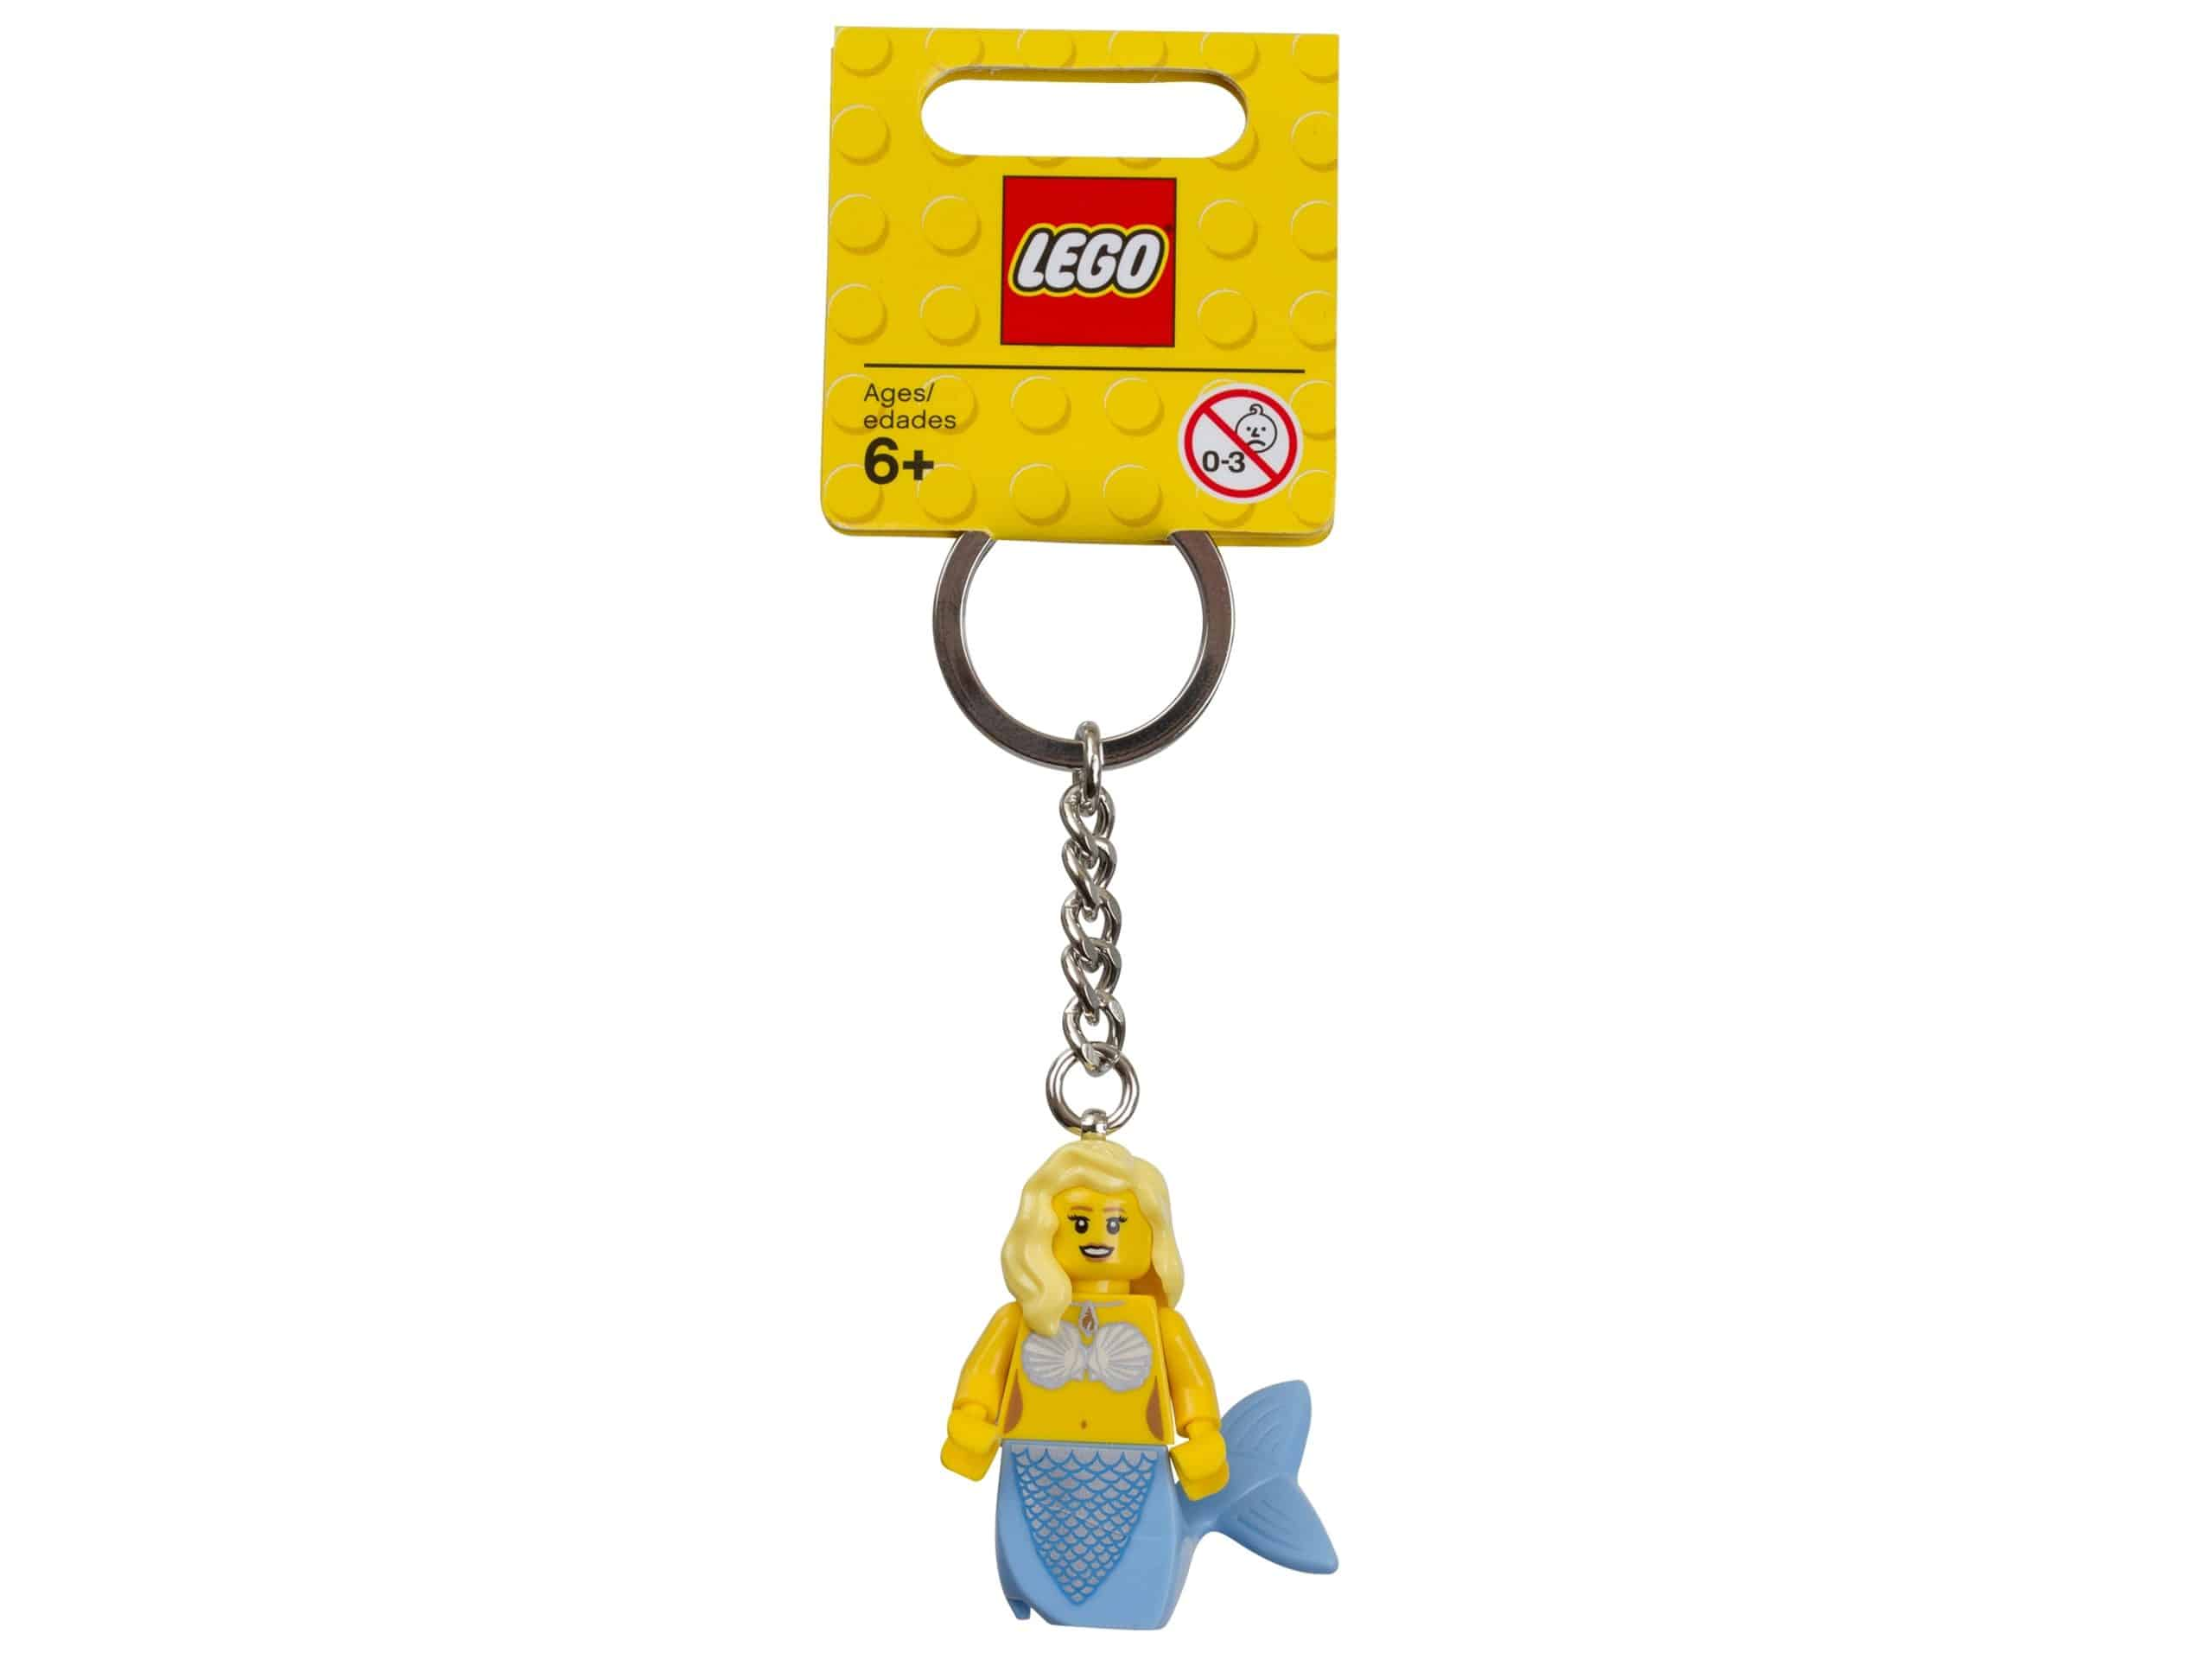 851393 official lego 851393 shop se scaled